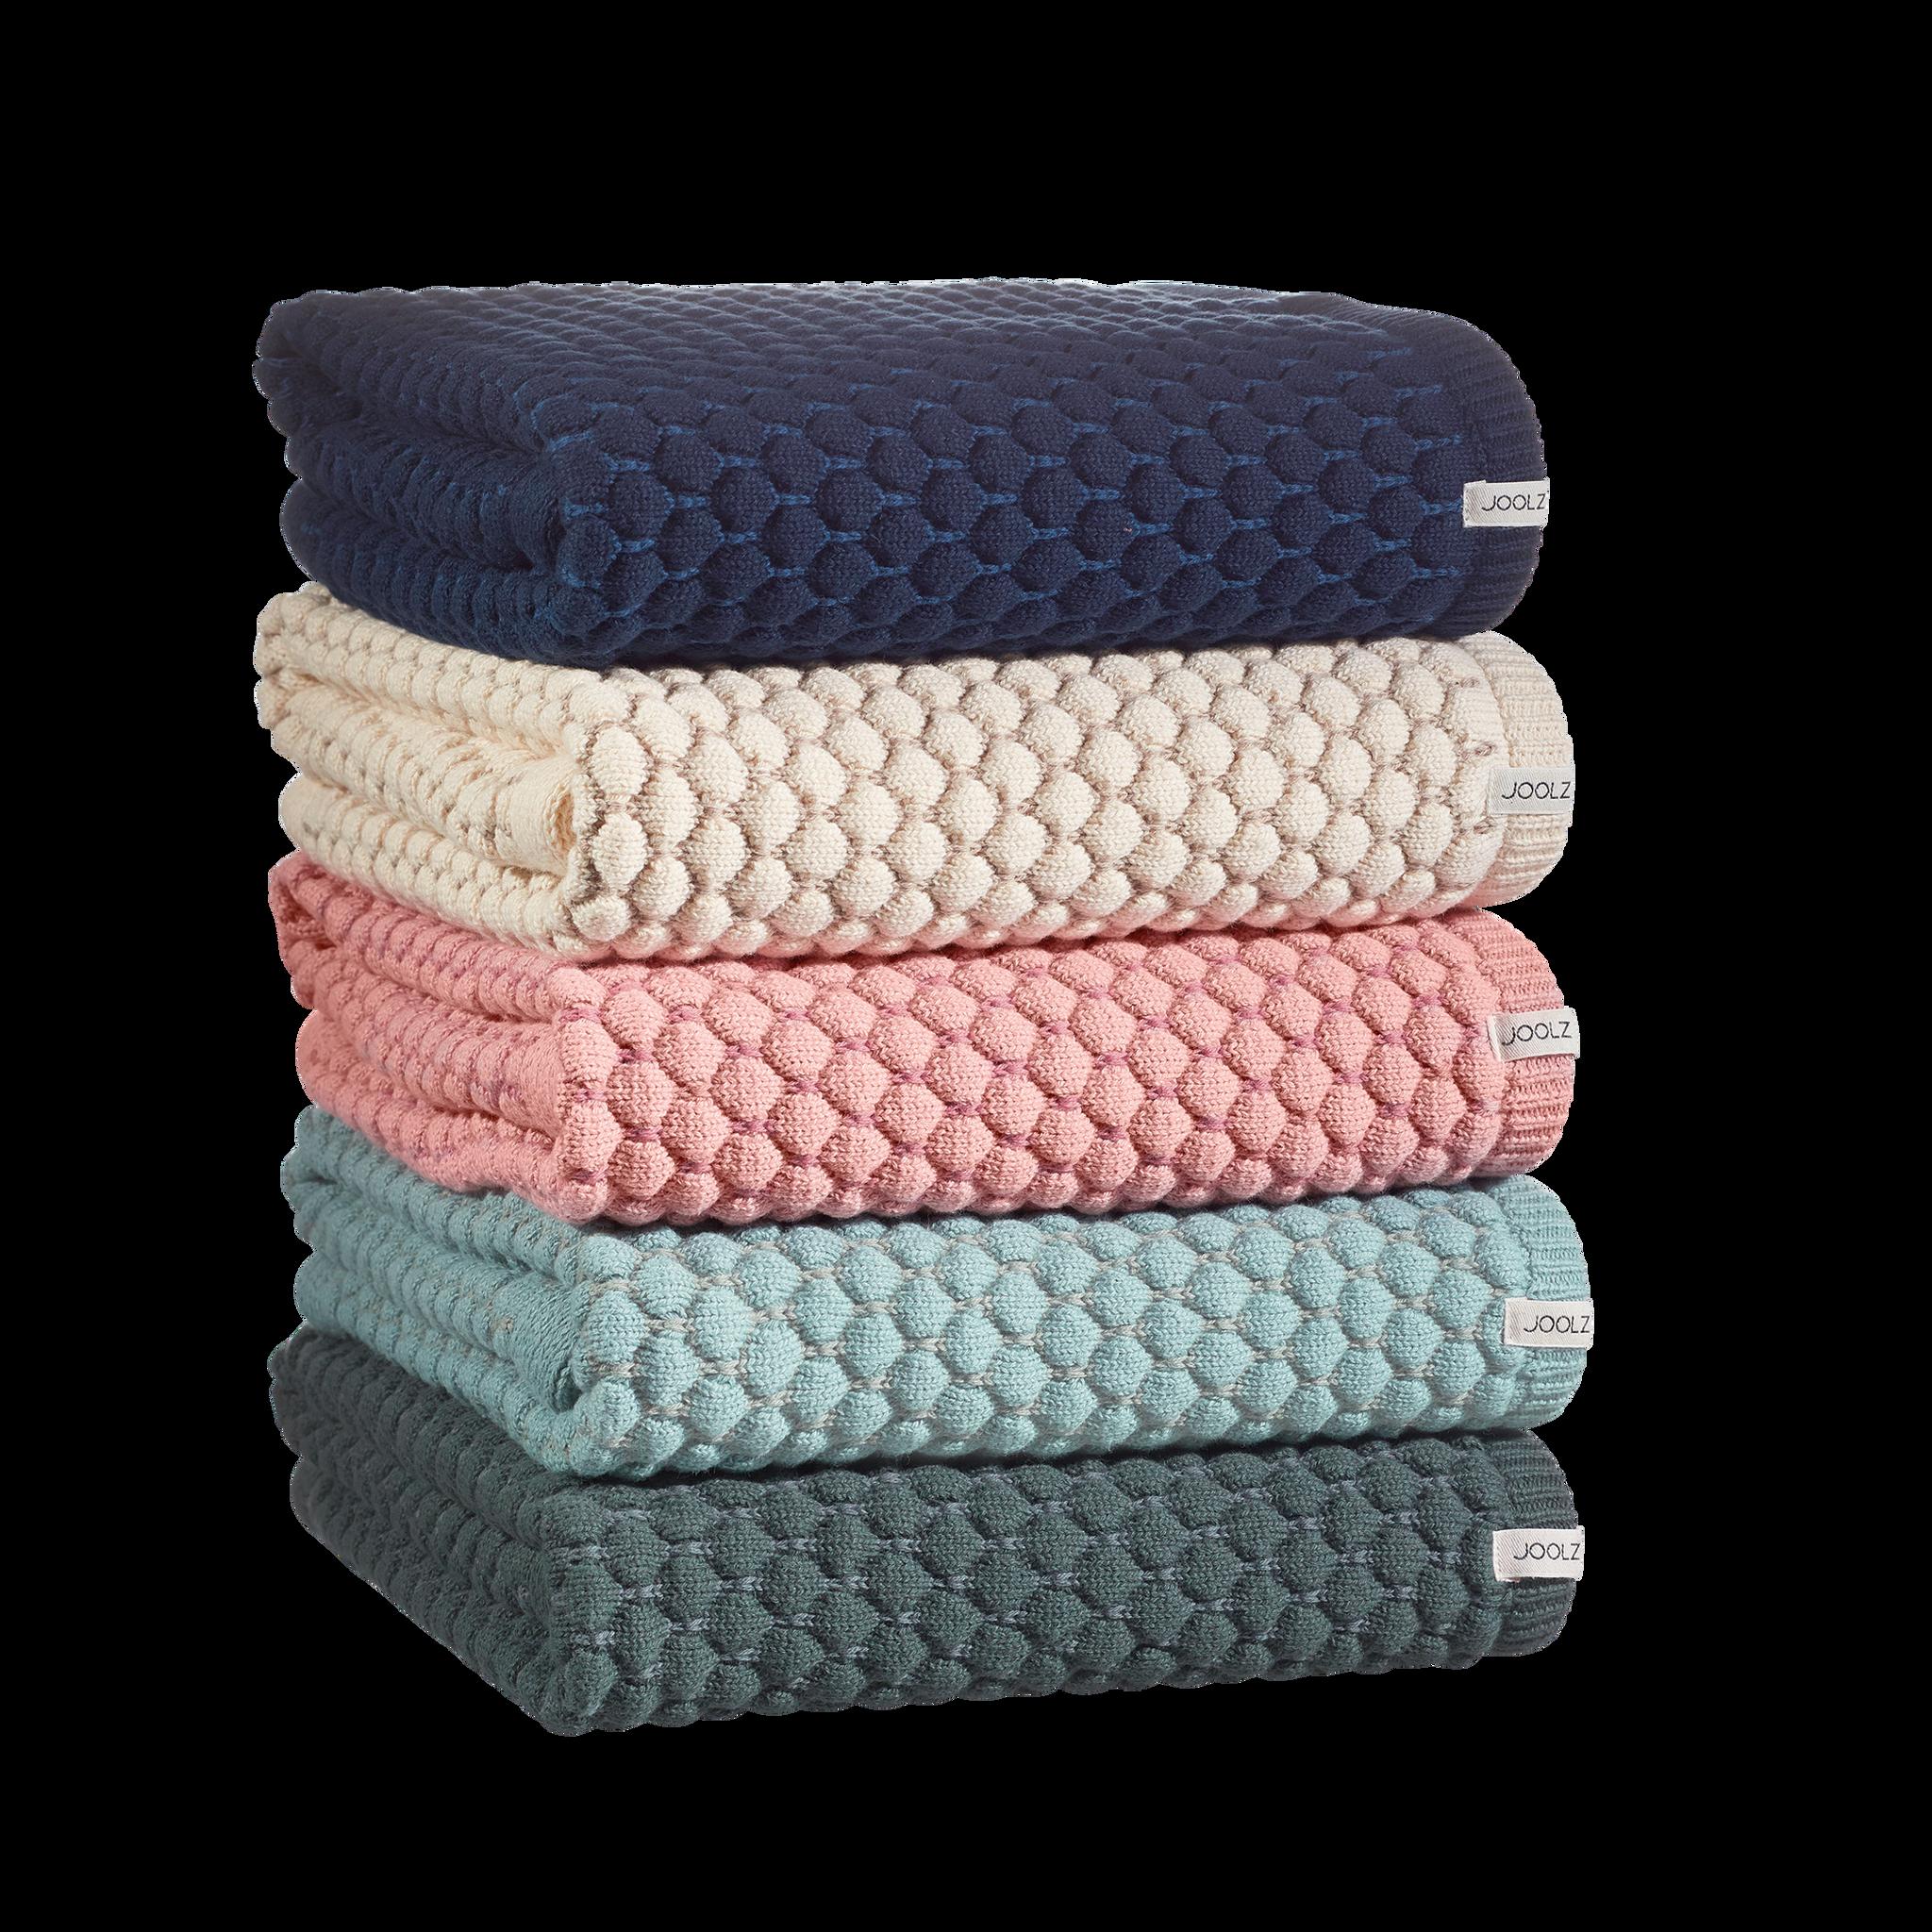 Joolz Blanket Honeycomb Collection Groen